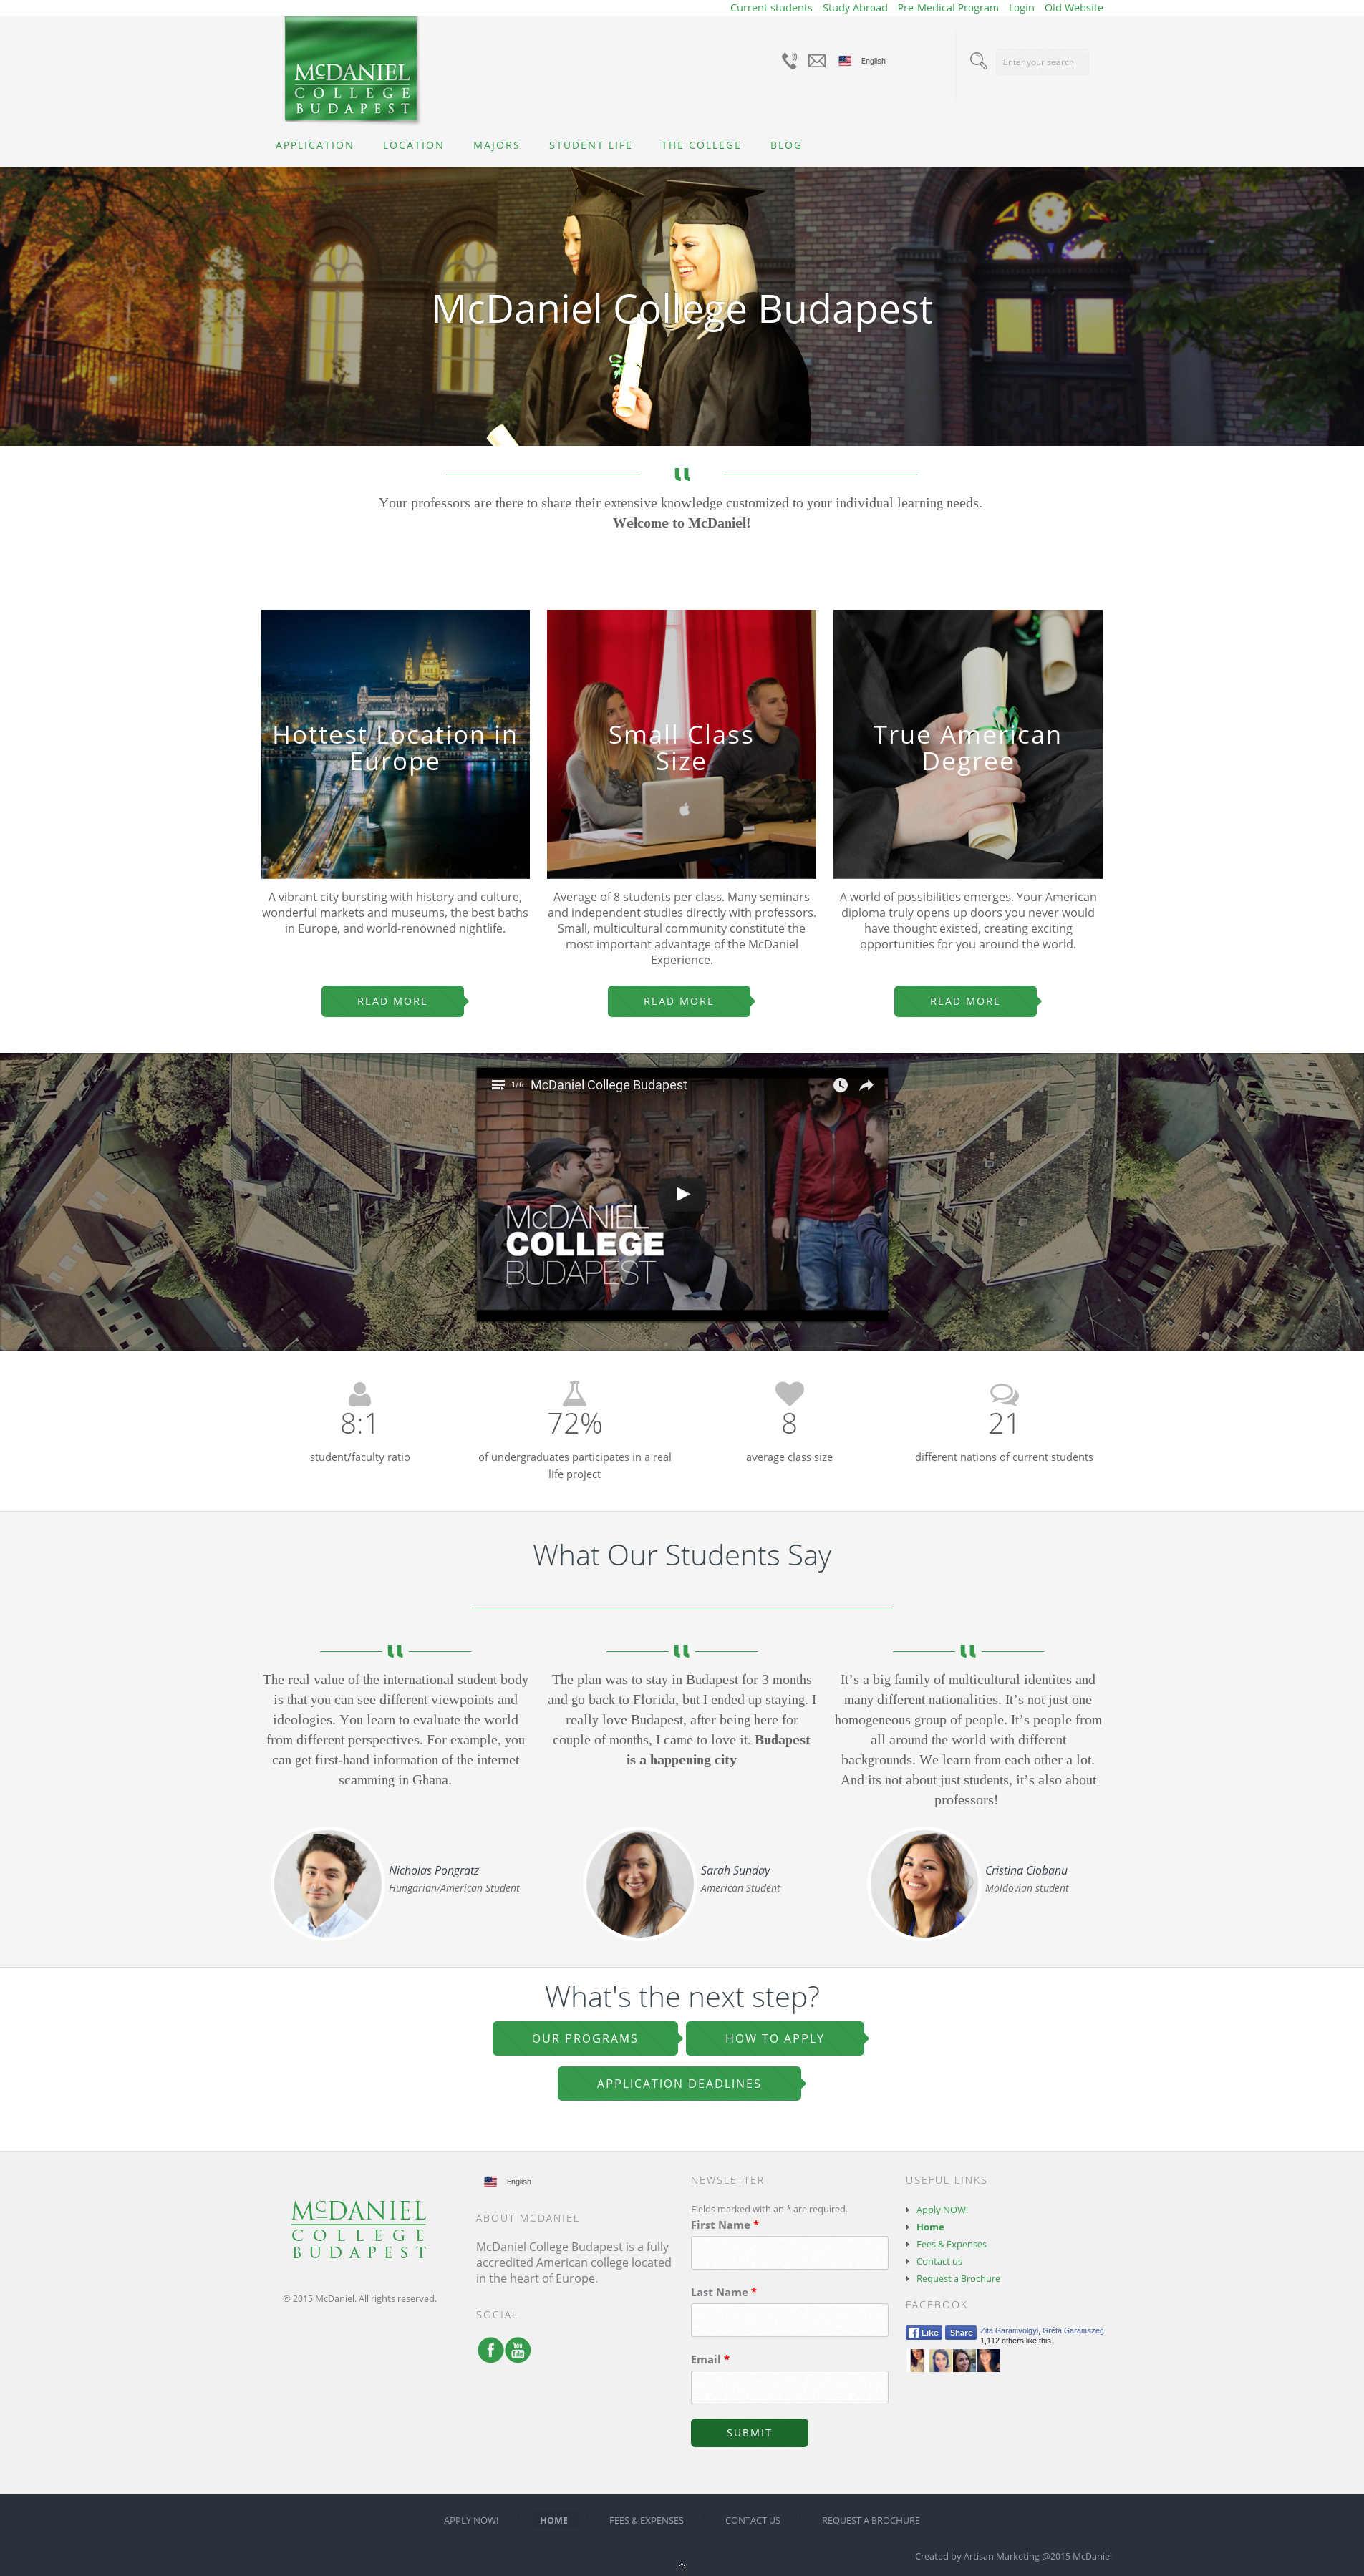 Mcdaniel College Budapest Website